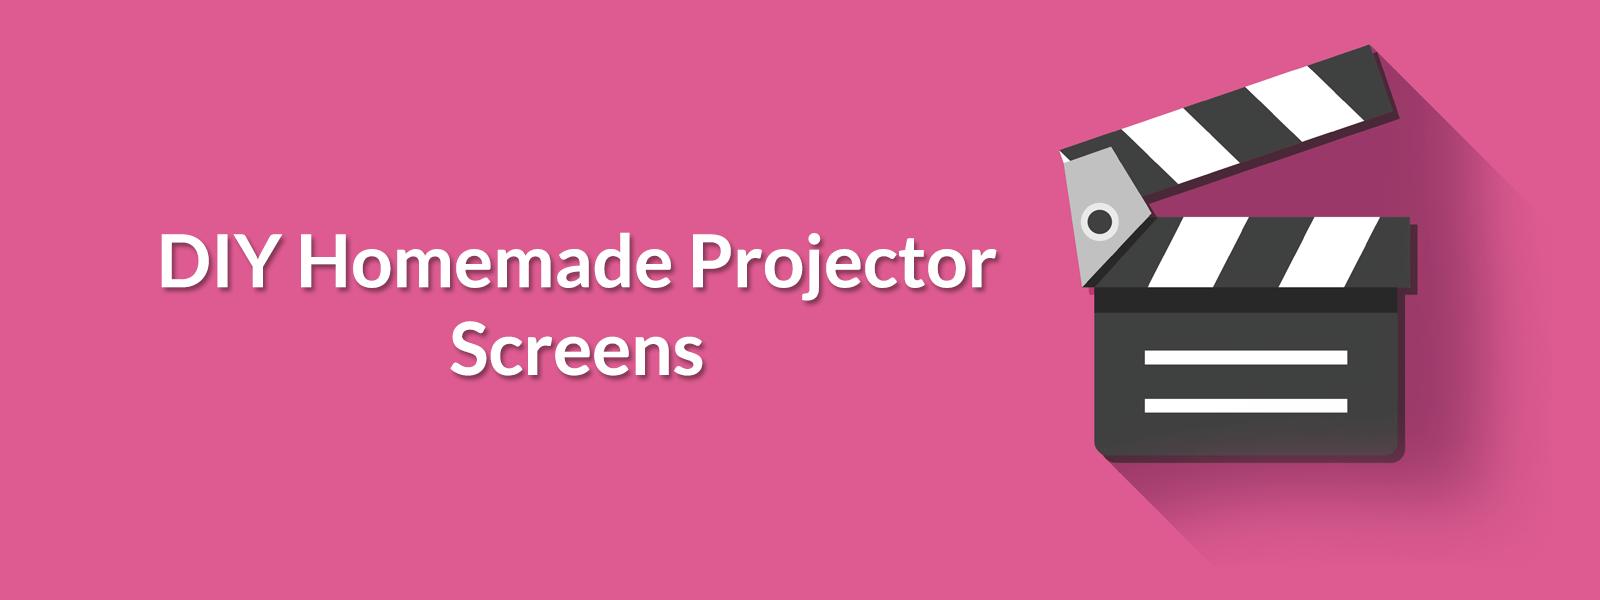 DIY Homemade Projector Screens